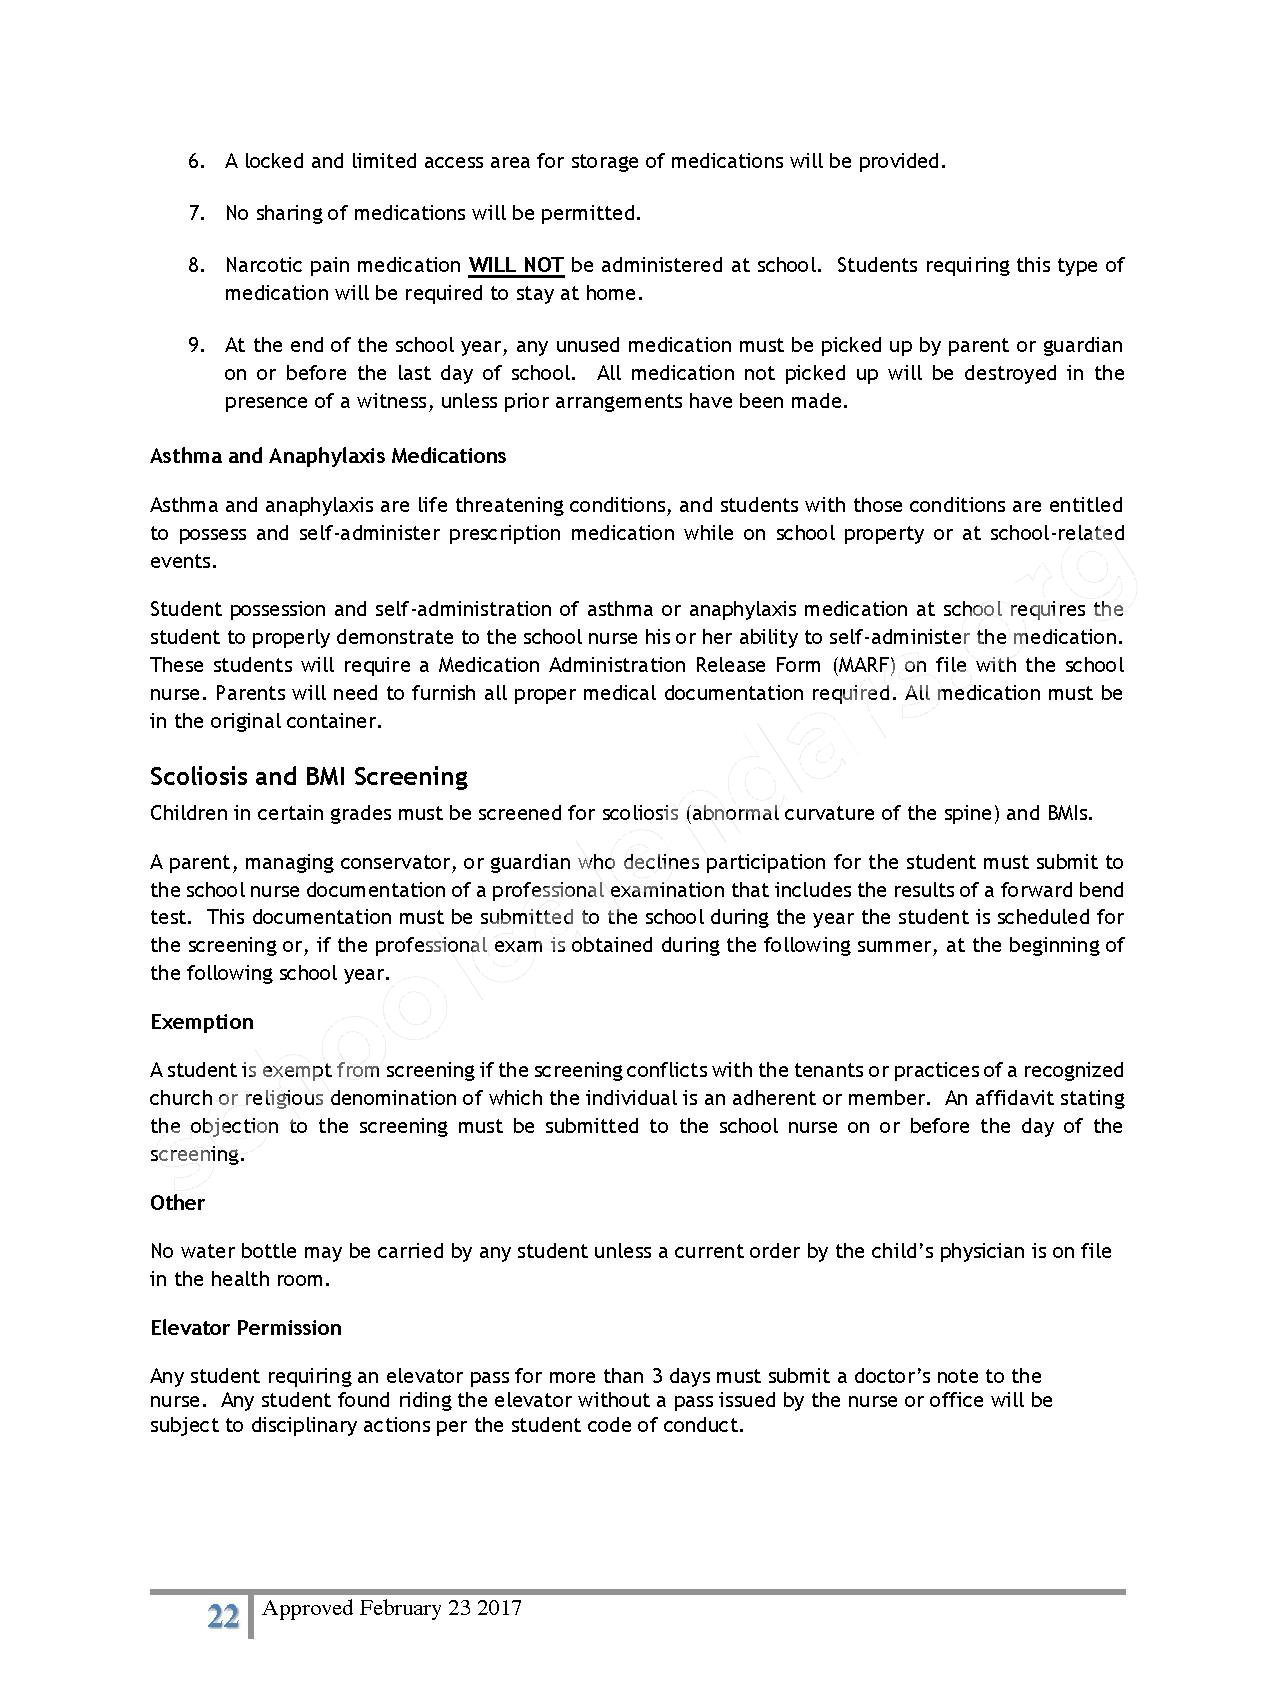 2016 - 2017 District Calendar – Lisa Academy Public Charter Schools – page 22